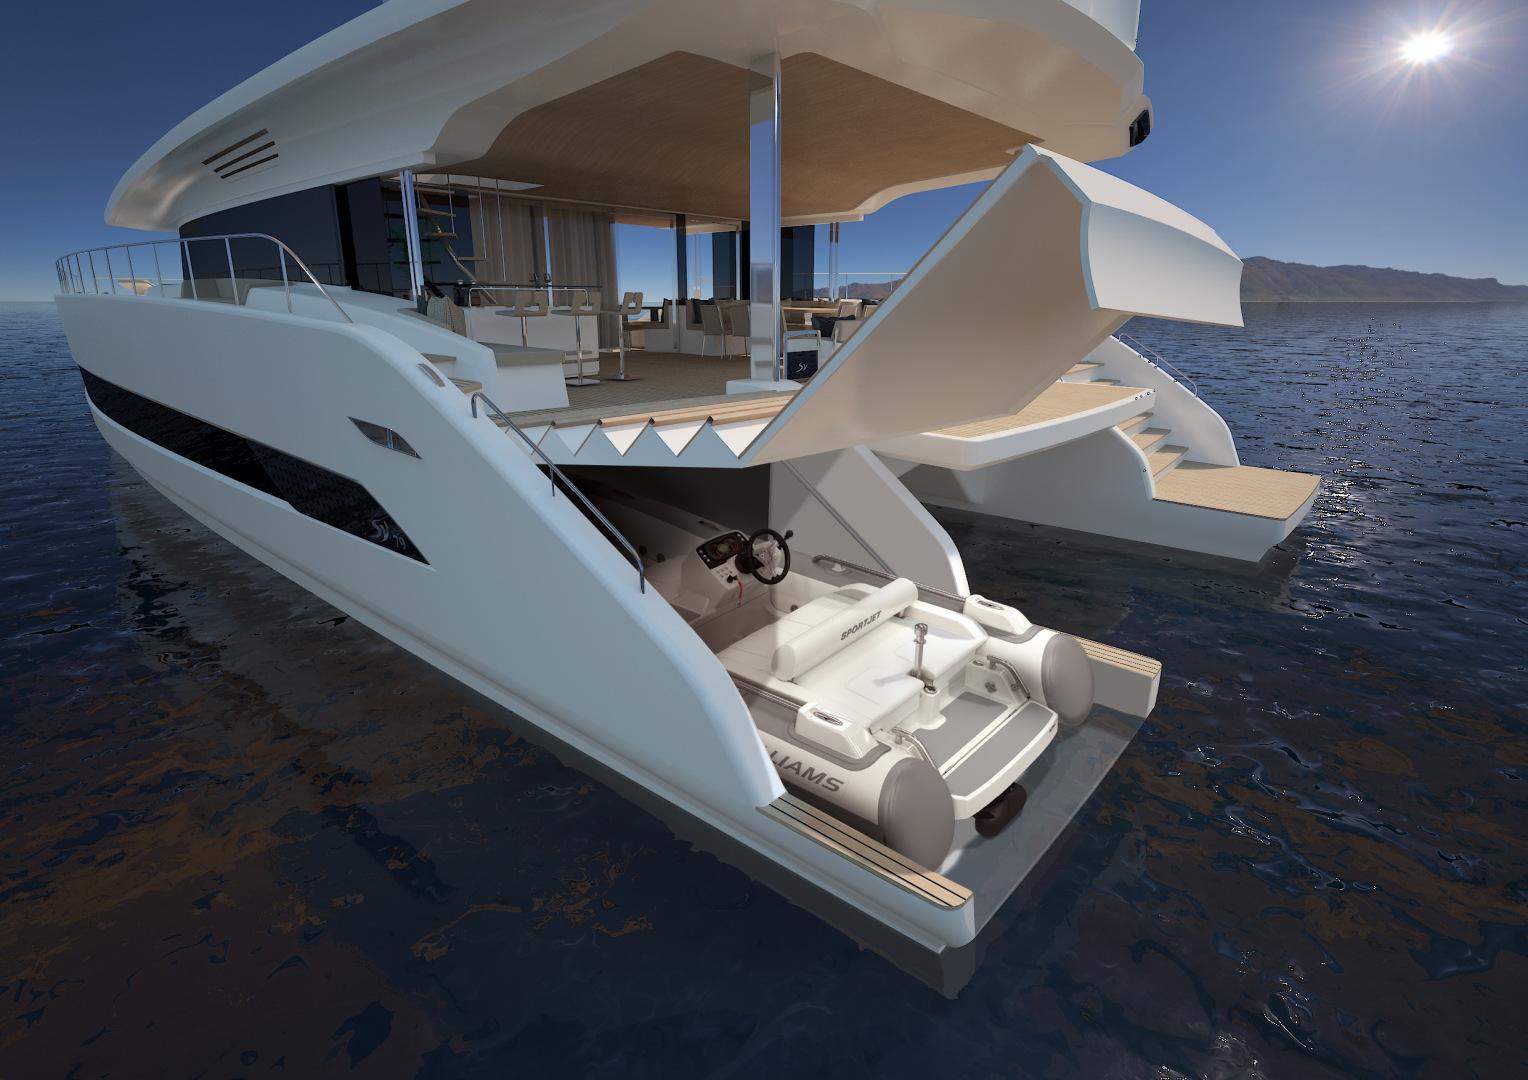 Silent-Yachts-Silent 80  2020-SILENT 80 Ancona-Italy-Lazzarette storage-1262441 | Thumbnail